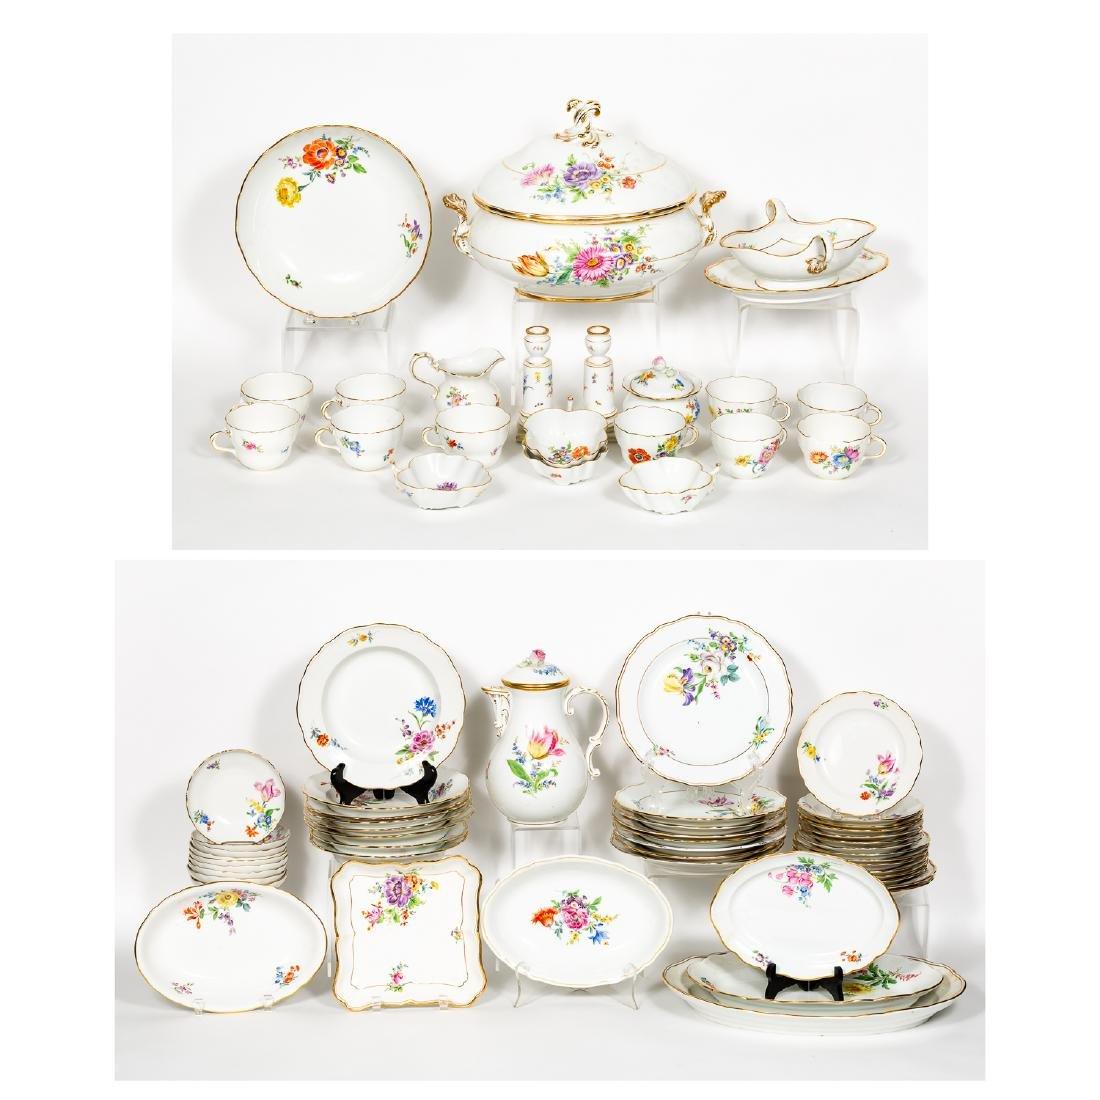 Meissen Porcelain Partial Dinner Service, Marked